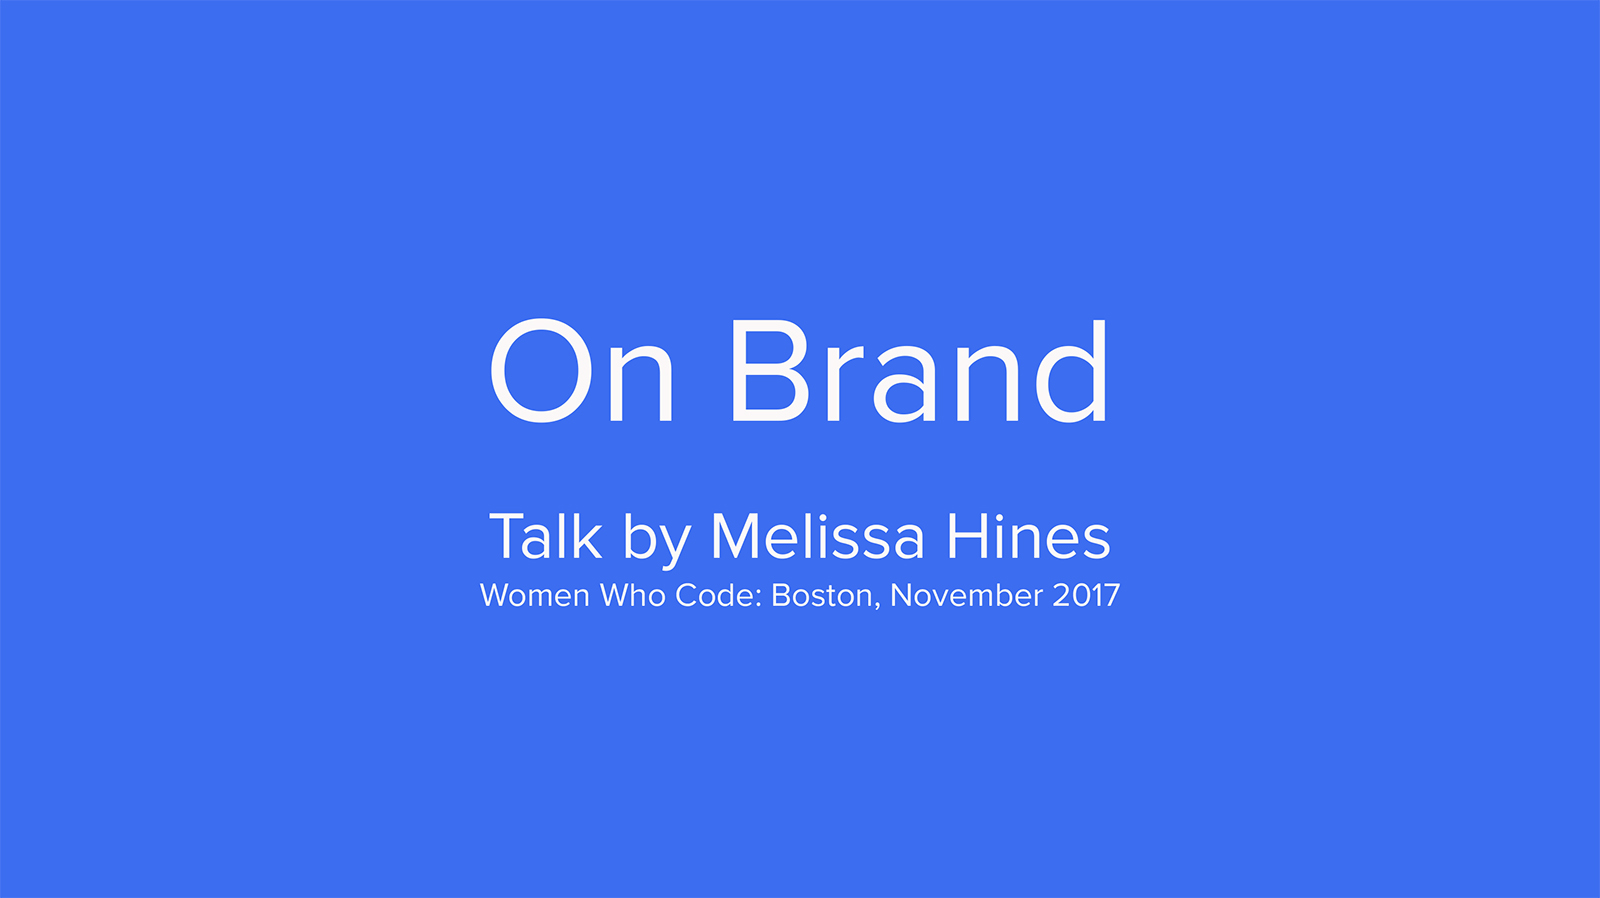 On Brand Design Talk Cover